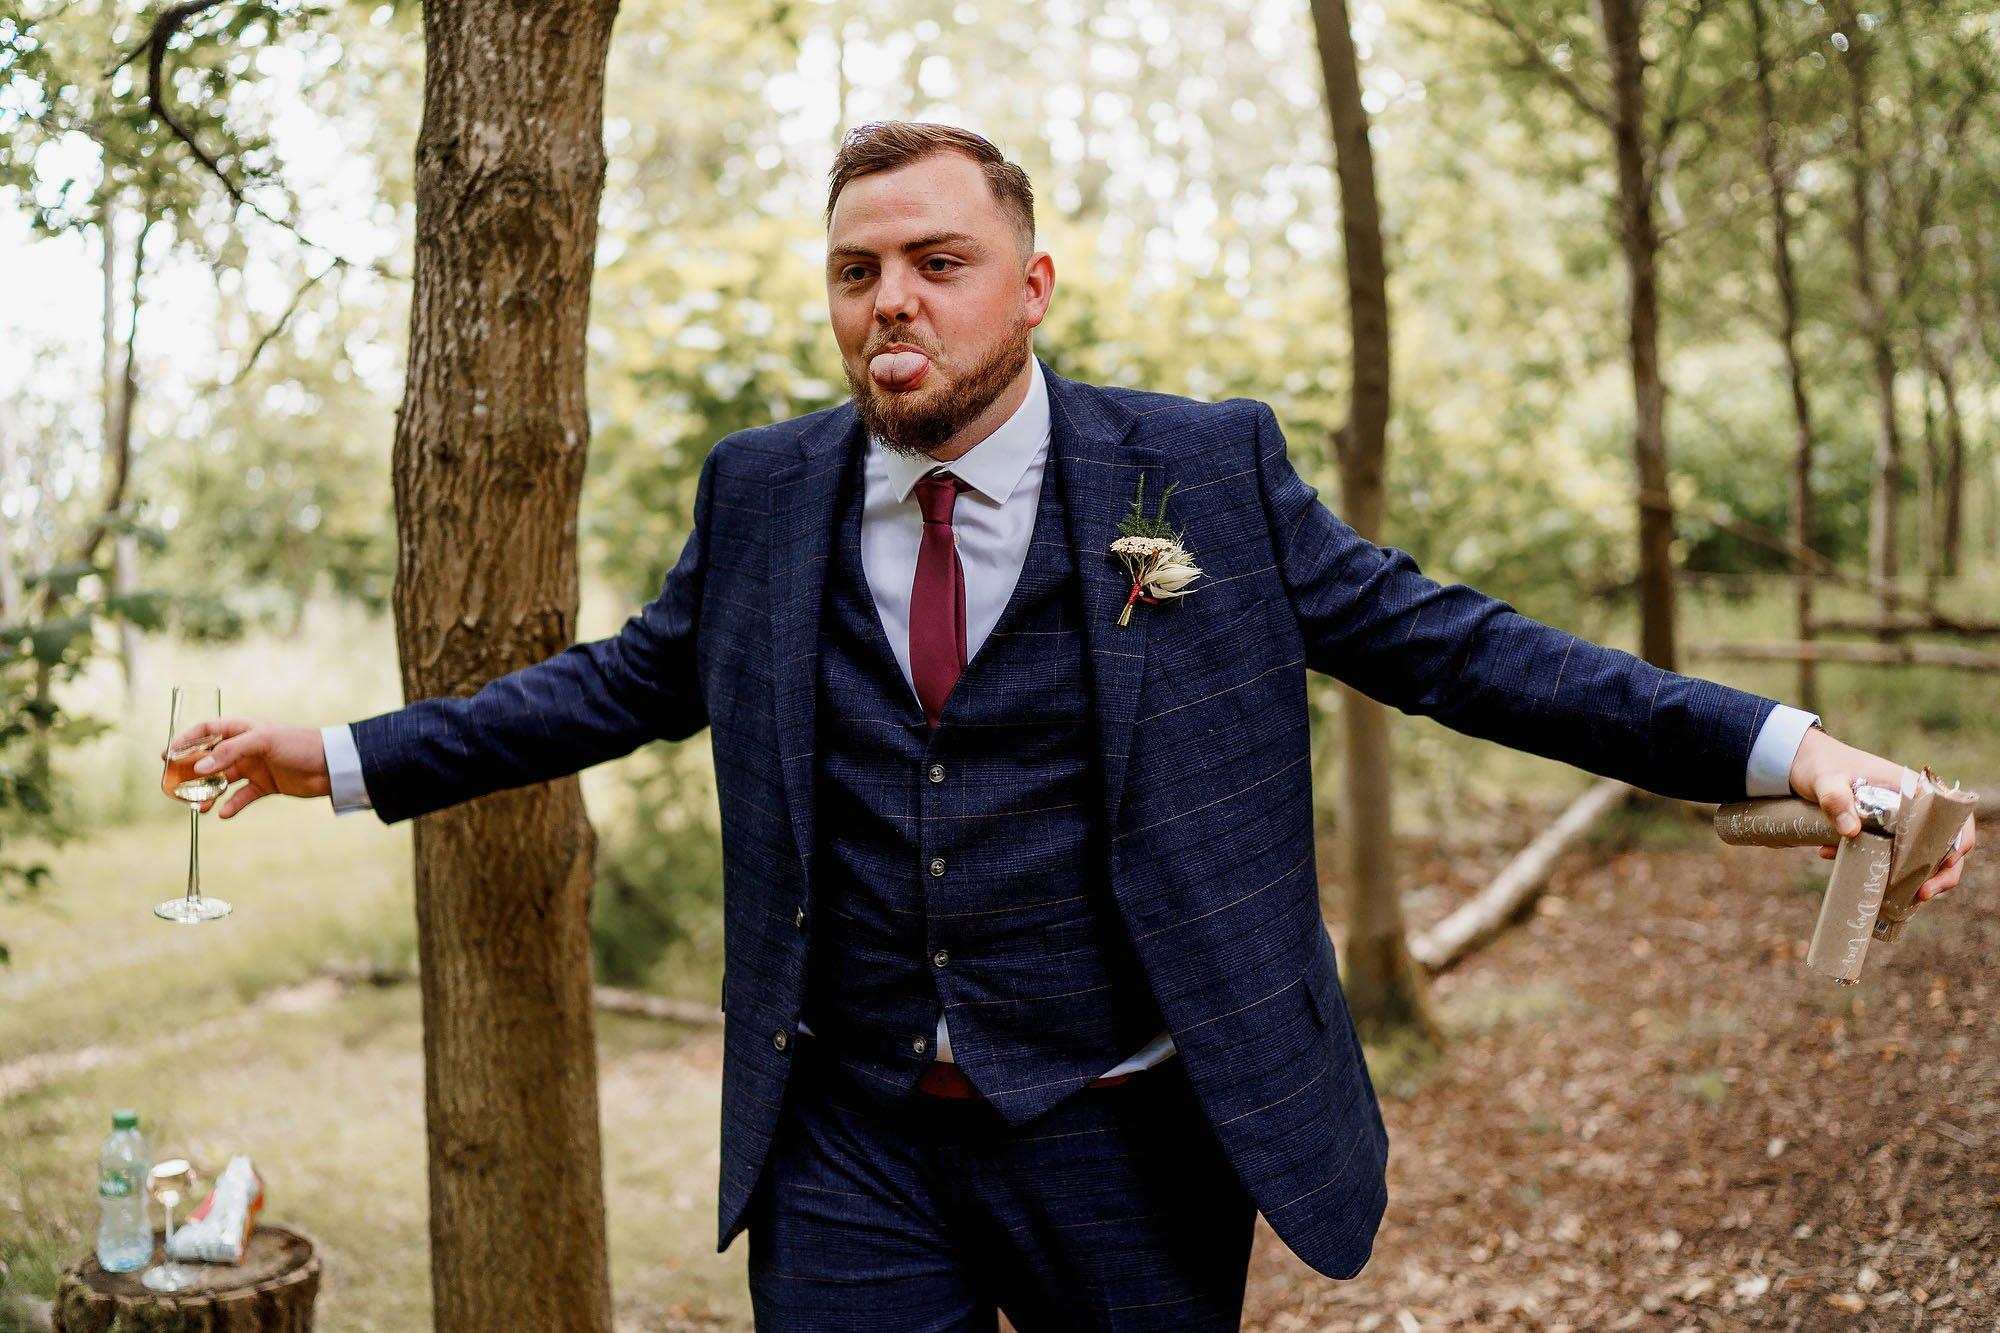 Woodland wedding photos - endeavour woodland weddings by arj photography®